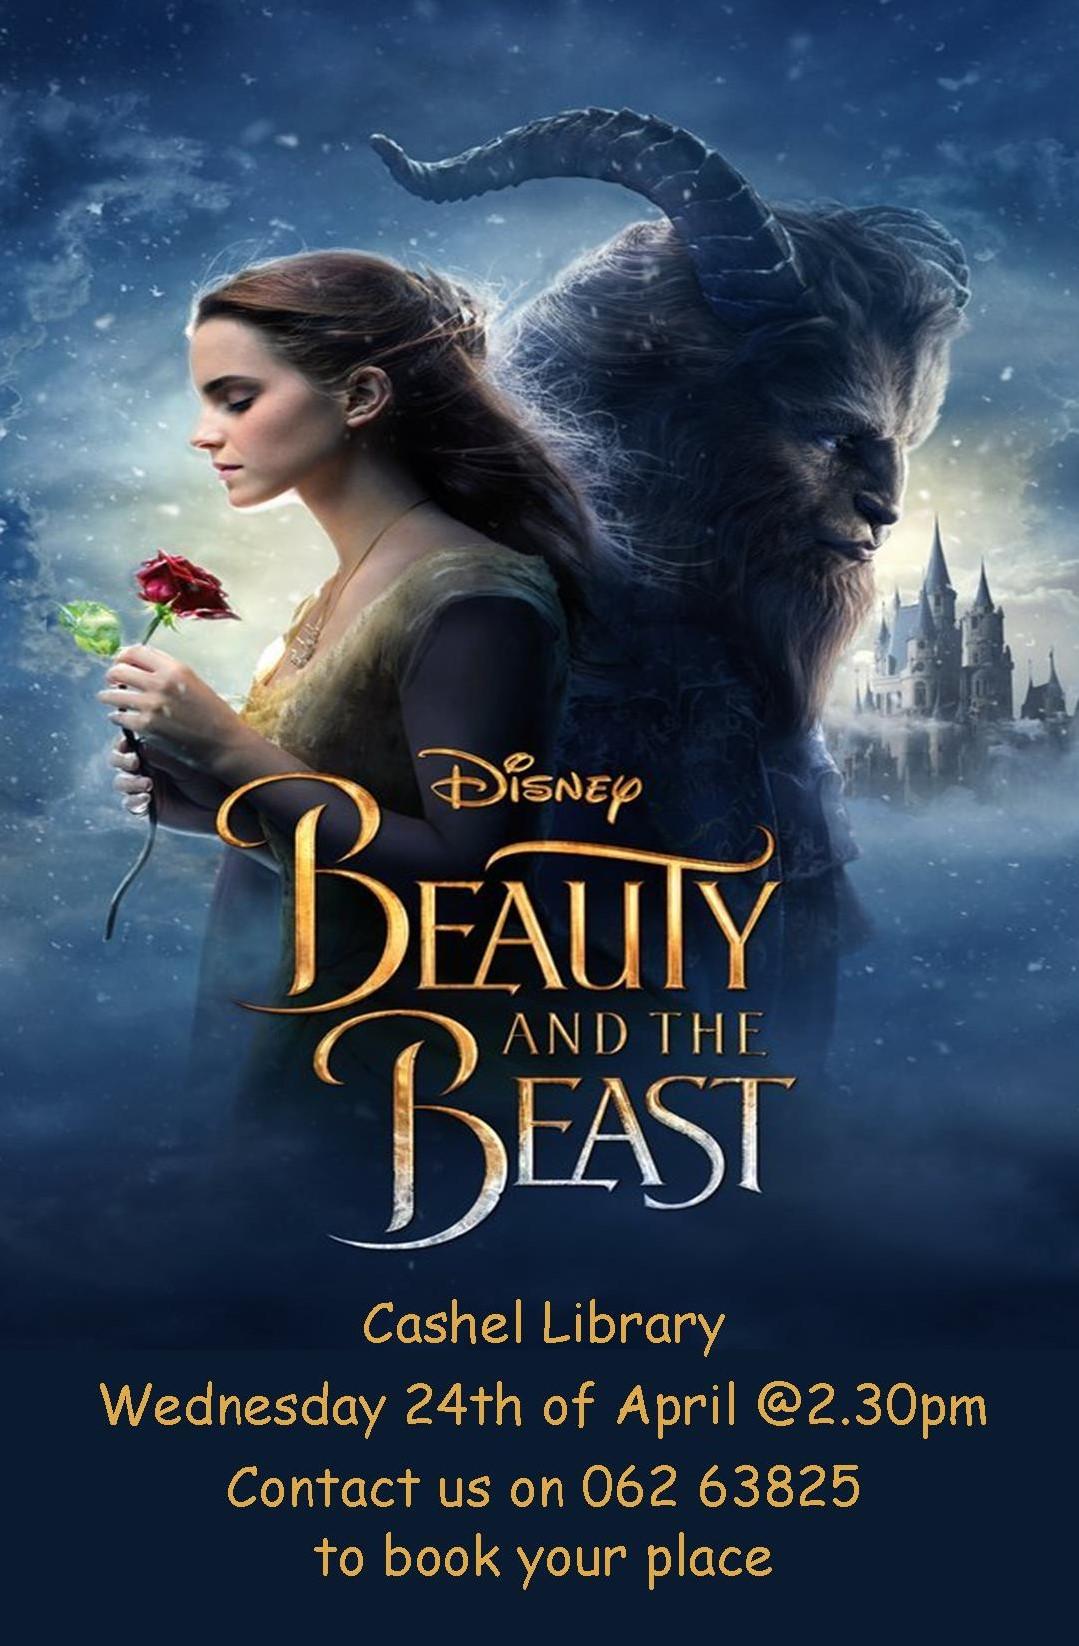 Cashel: Beauty And The Beast Film